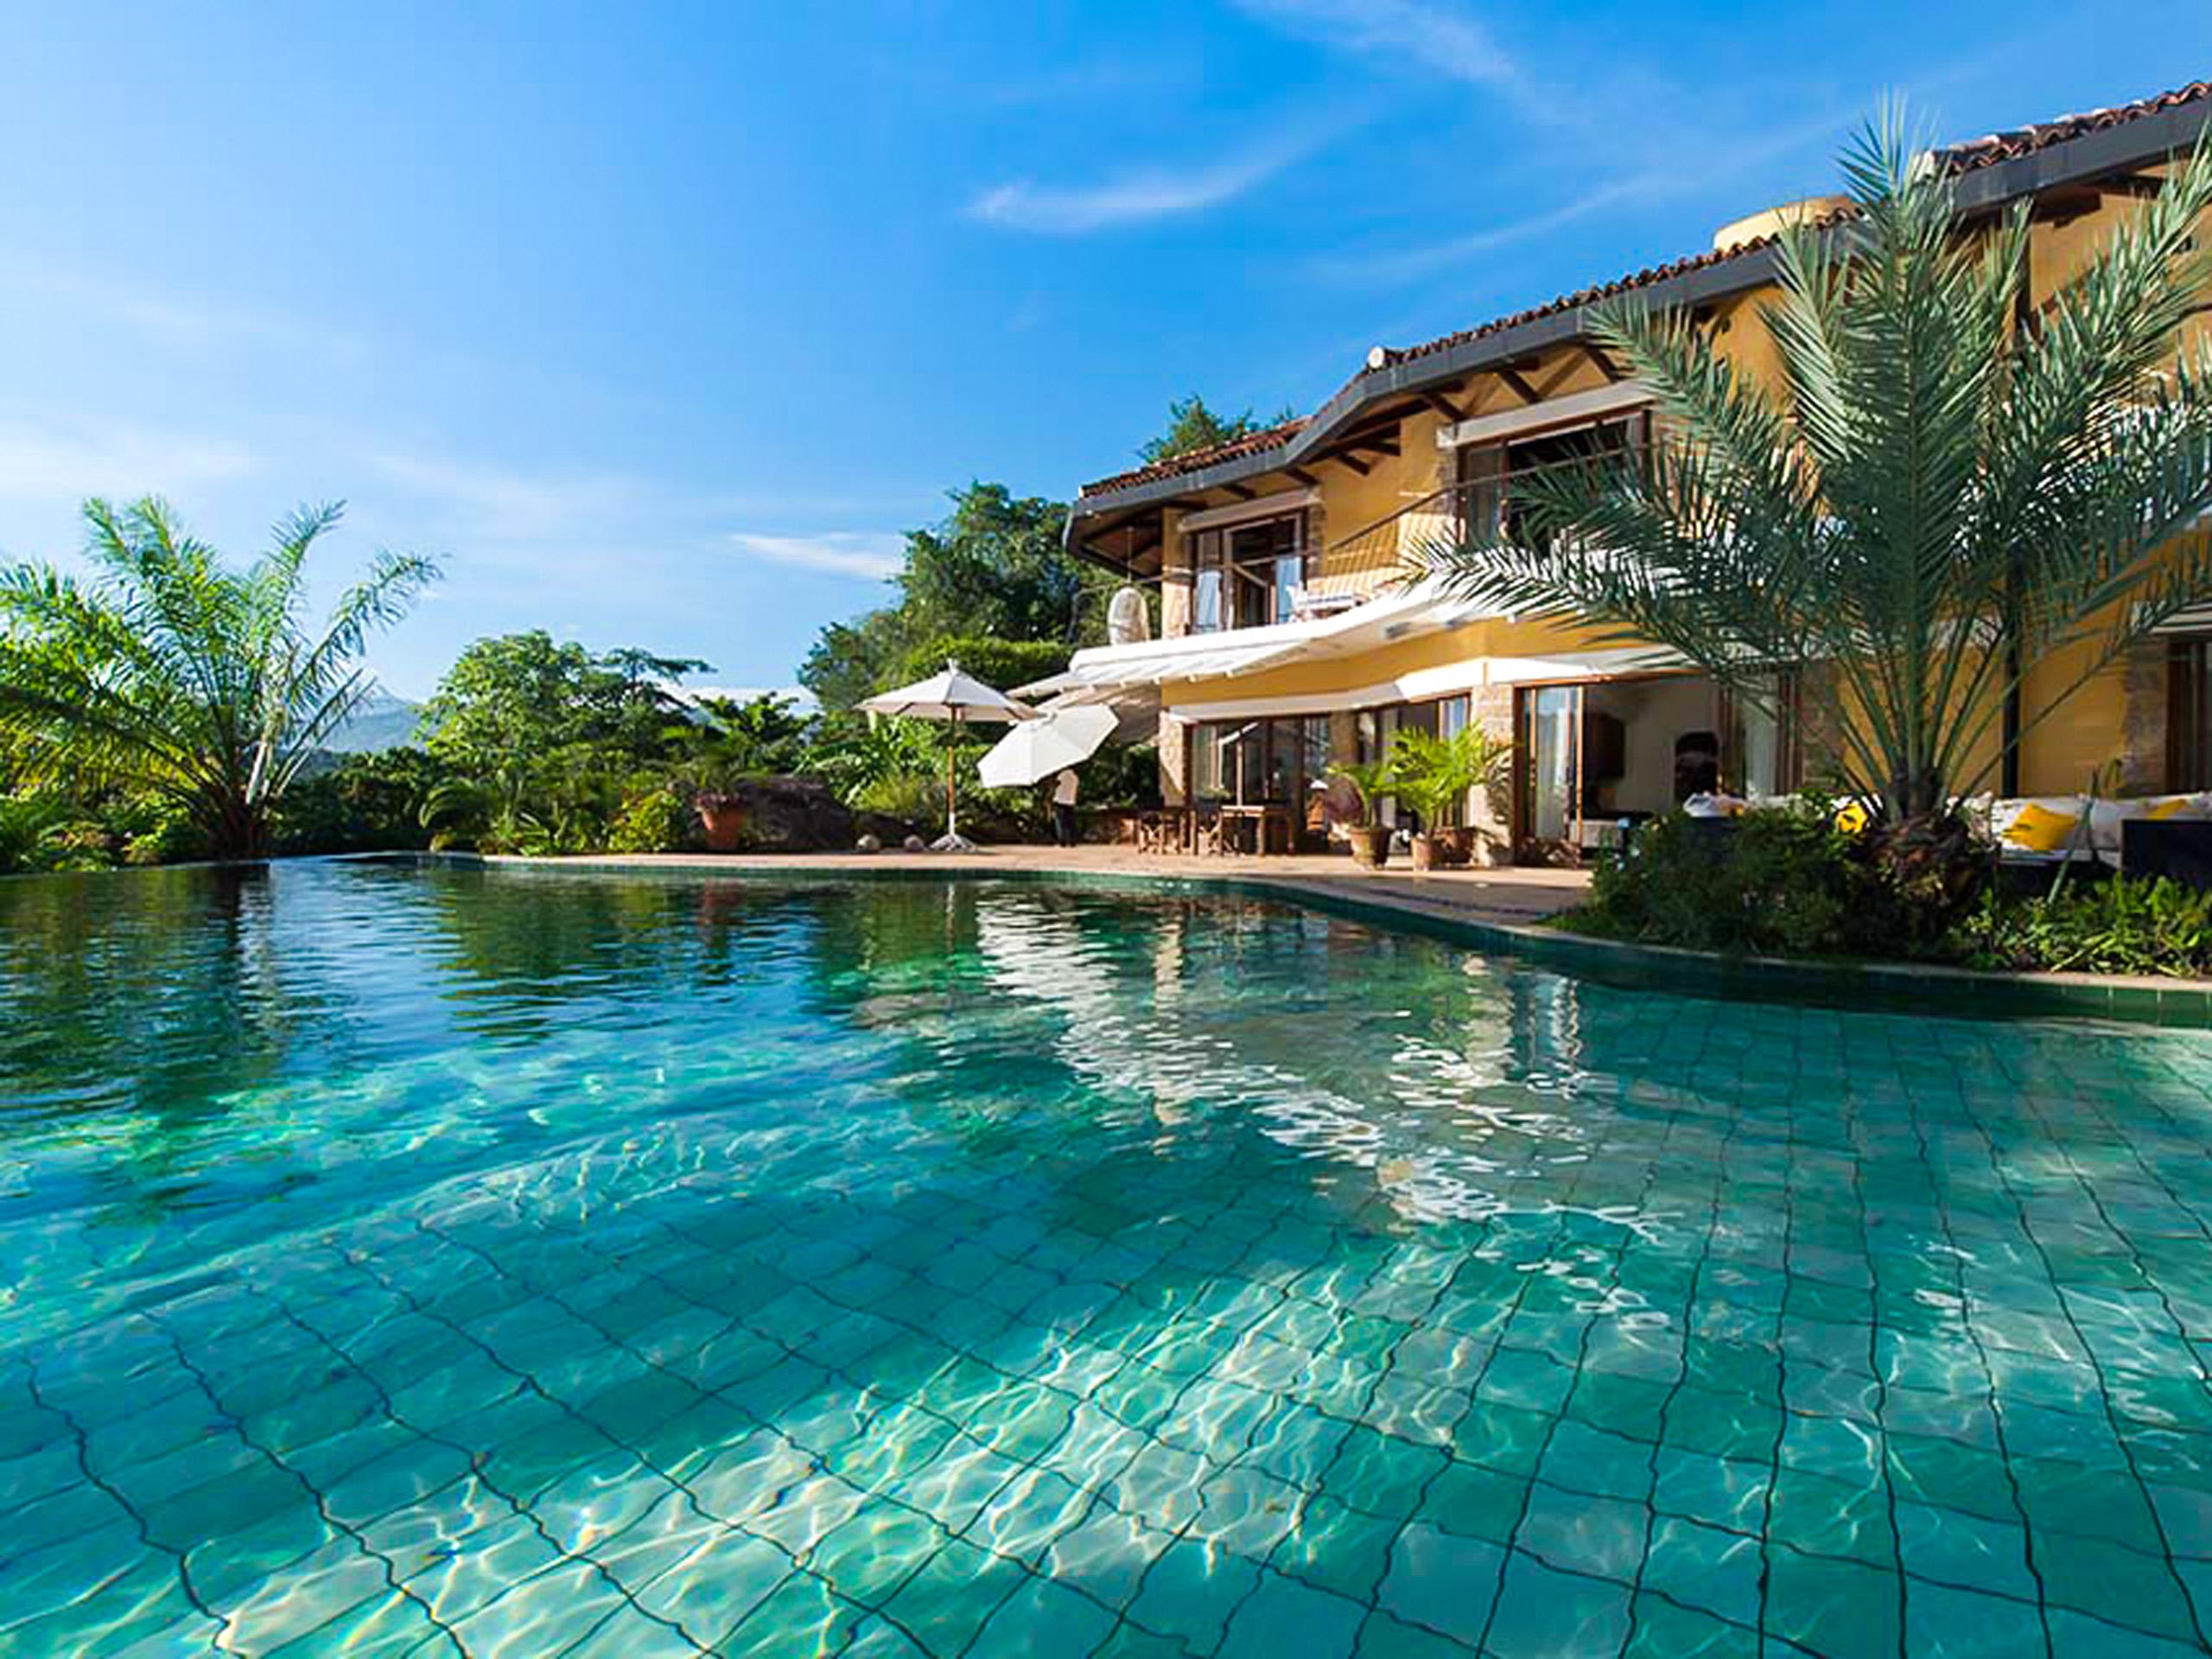 Beautiful pool in Bougainvillea Hotel